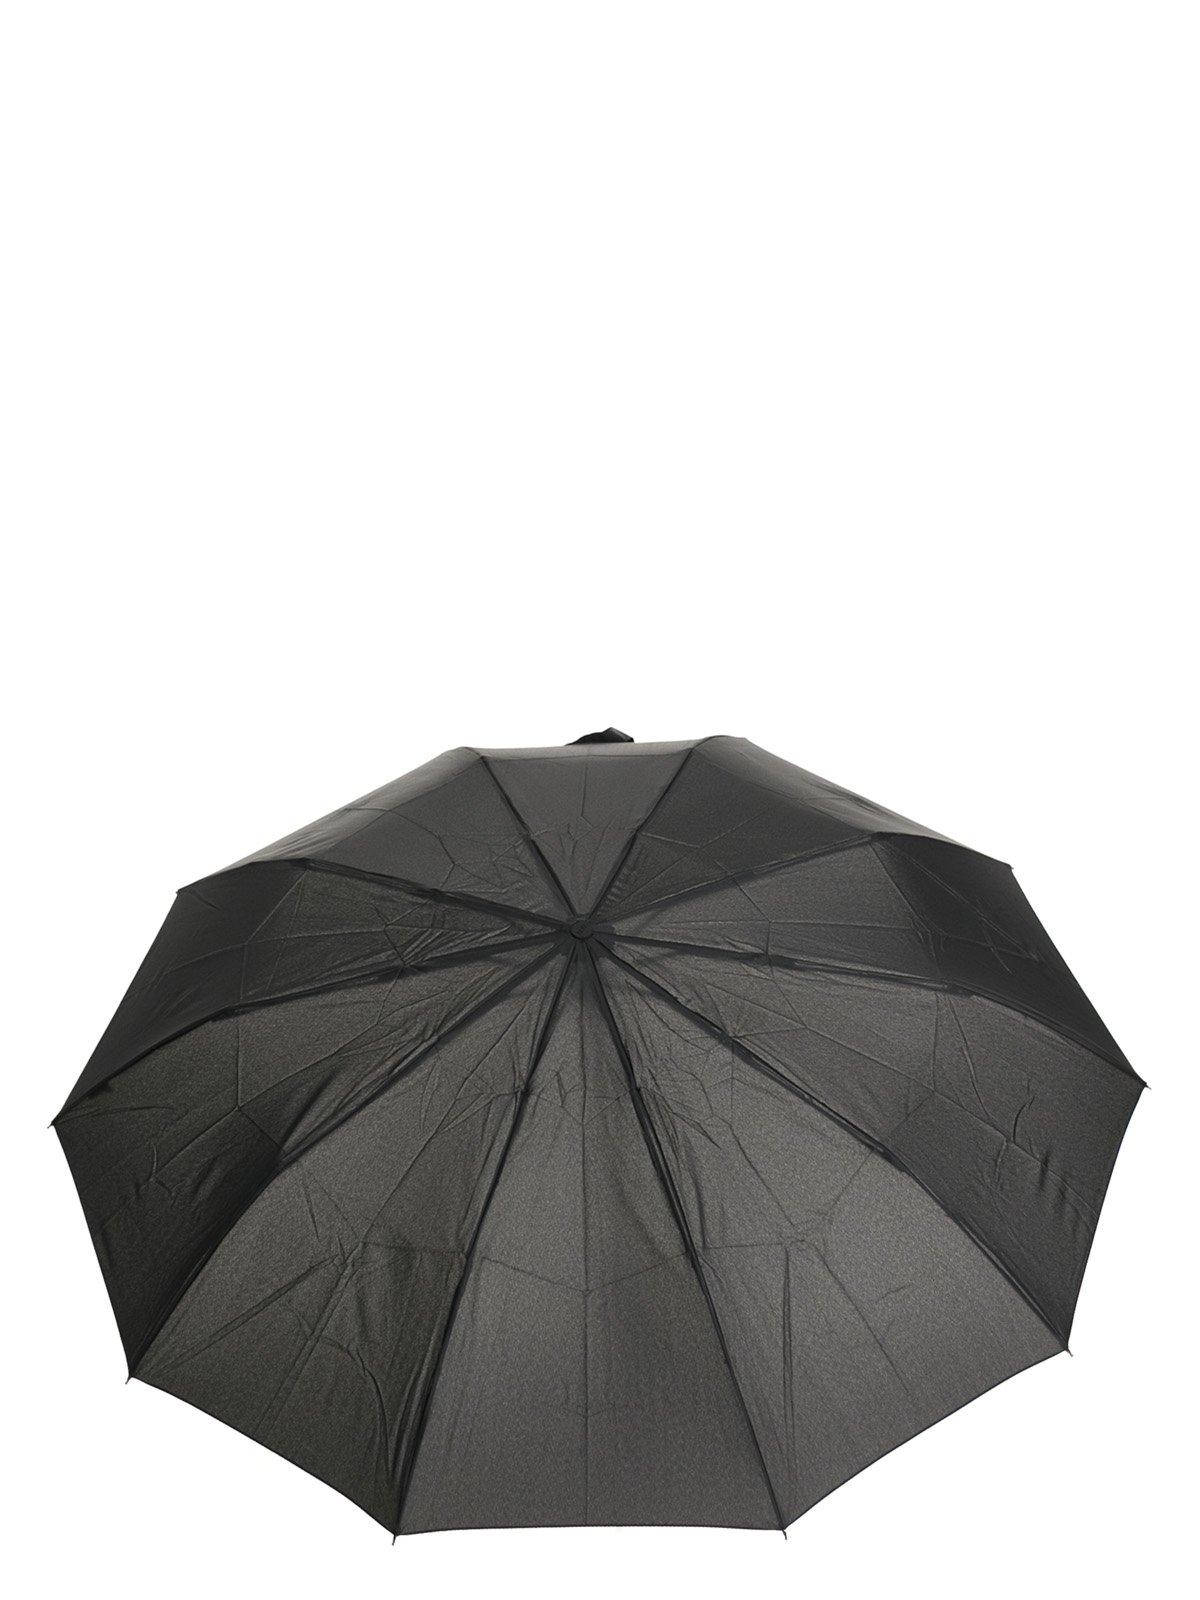 Зонт-полуавтомат   968810